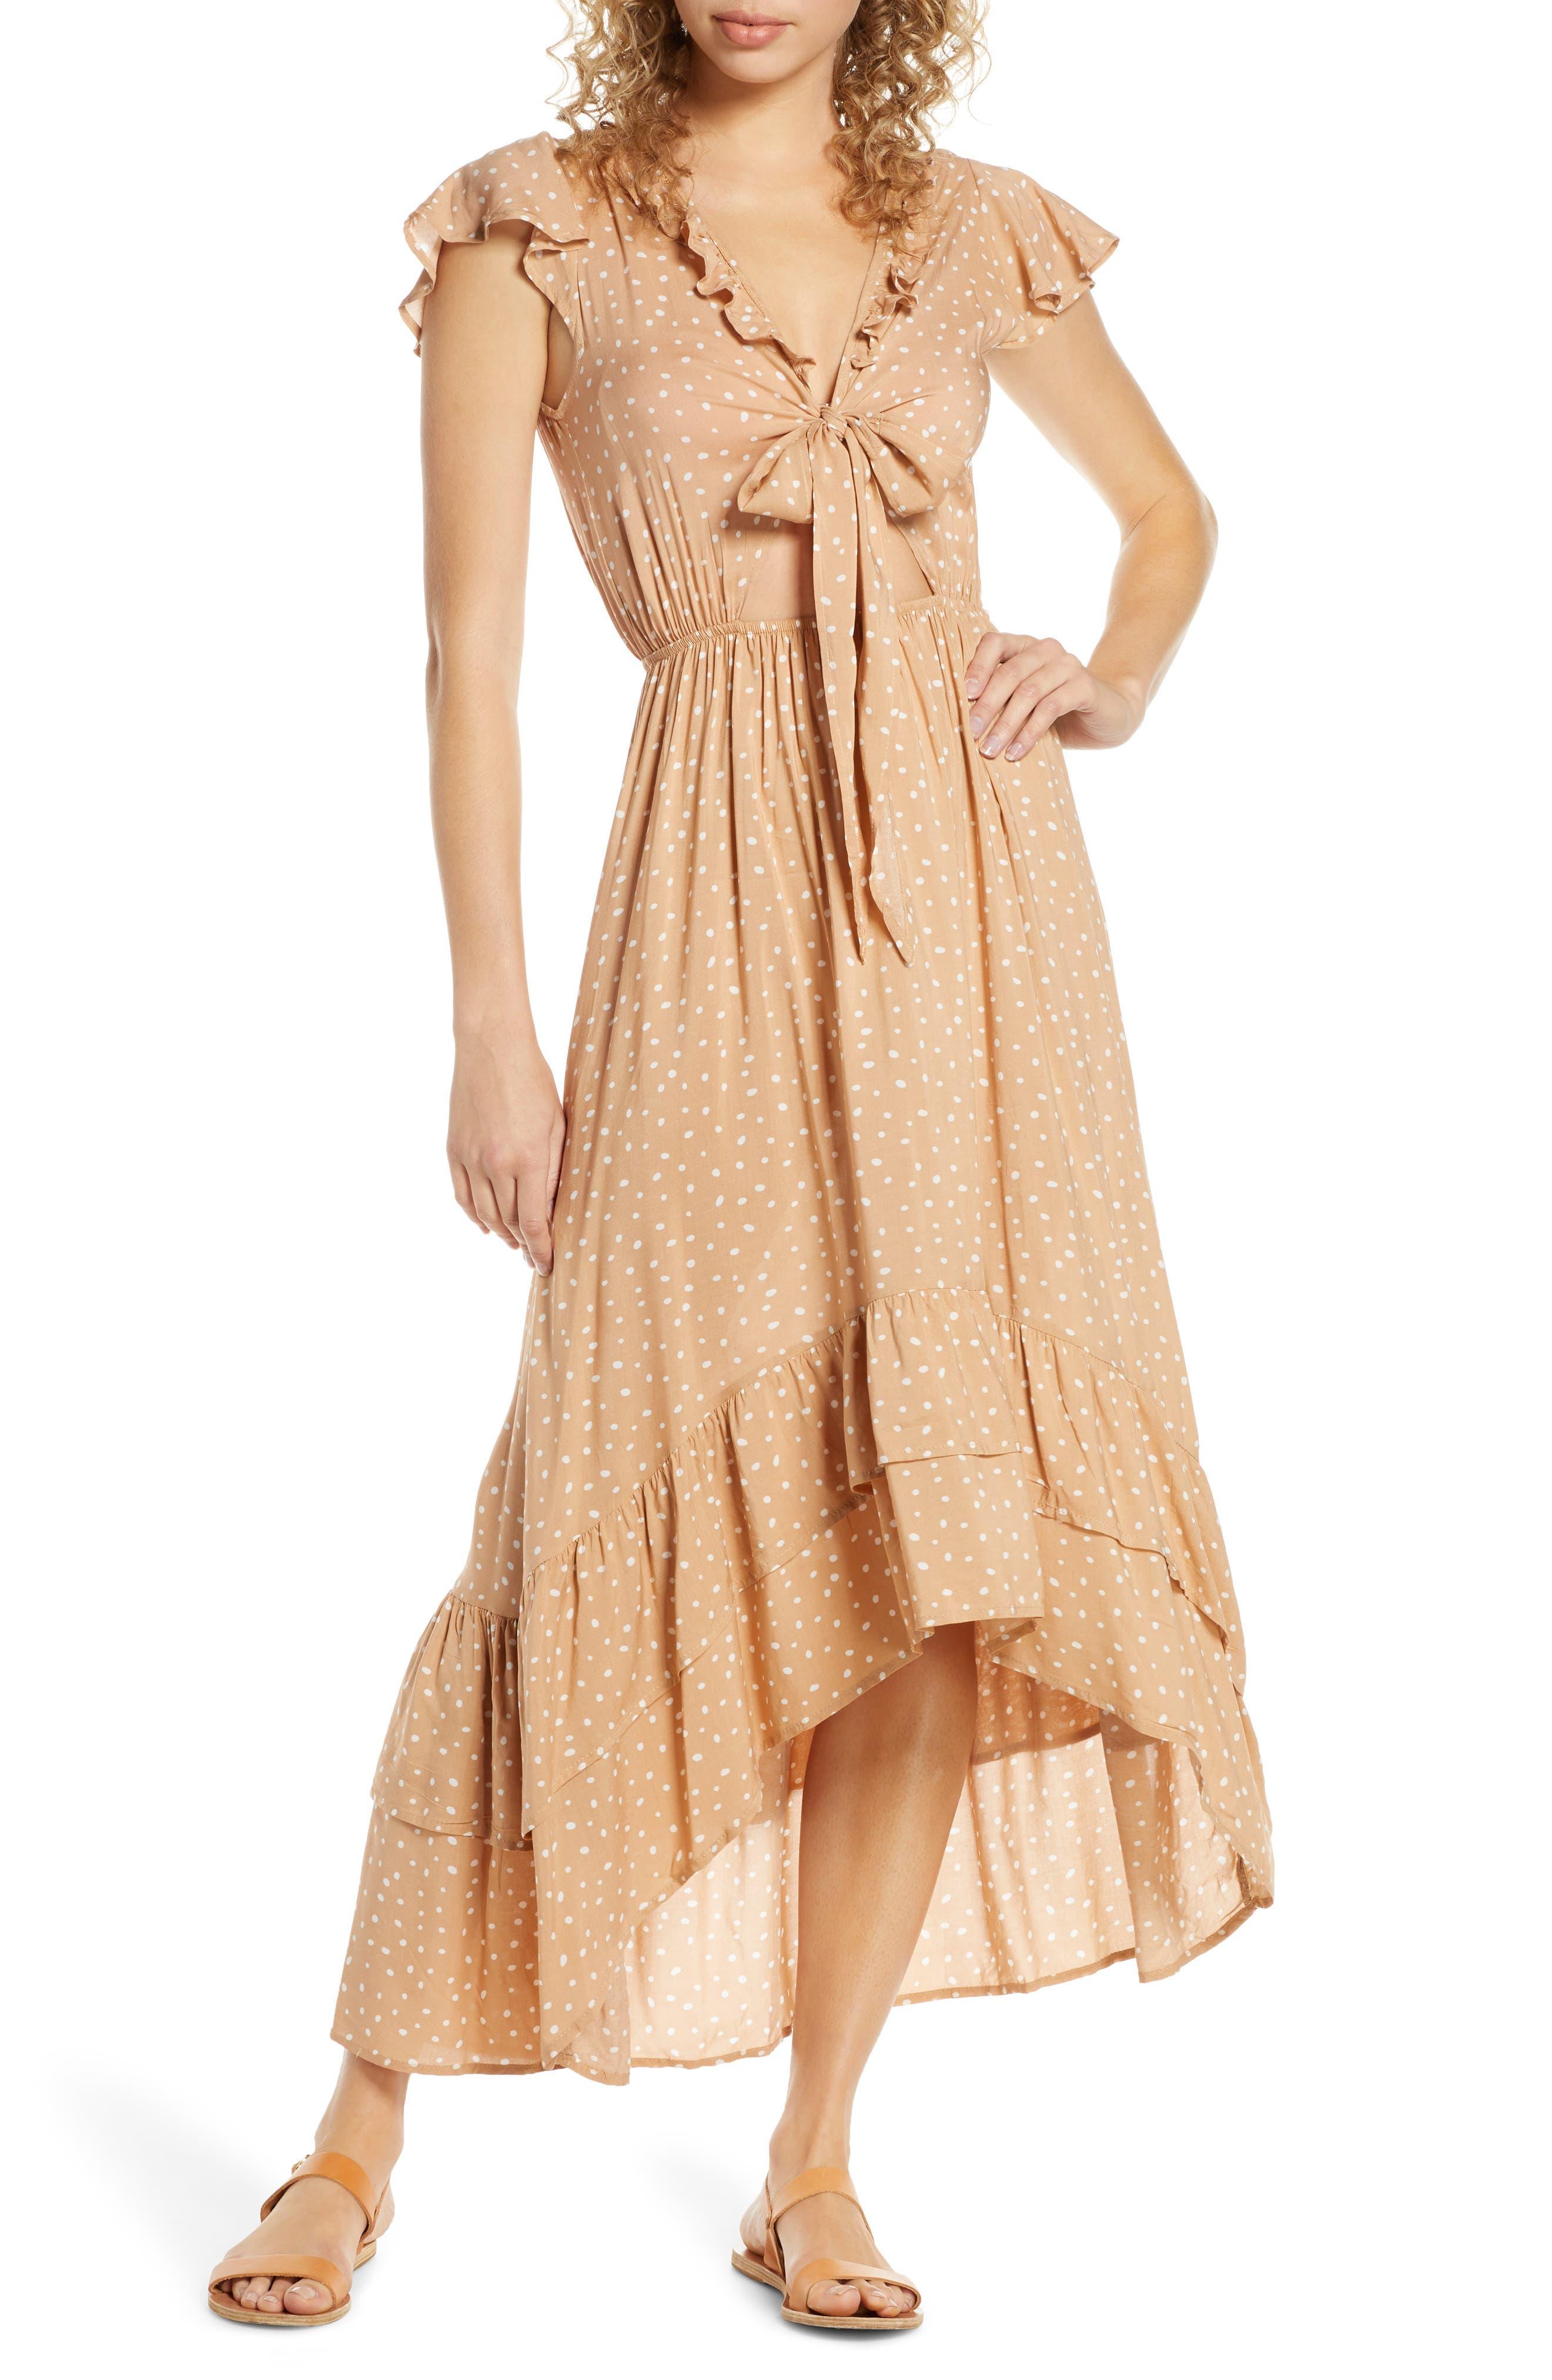 Surf Gypsy Distress Diamond High/low Cover-Up Dress, Metallic